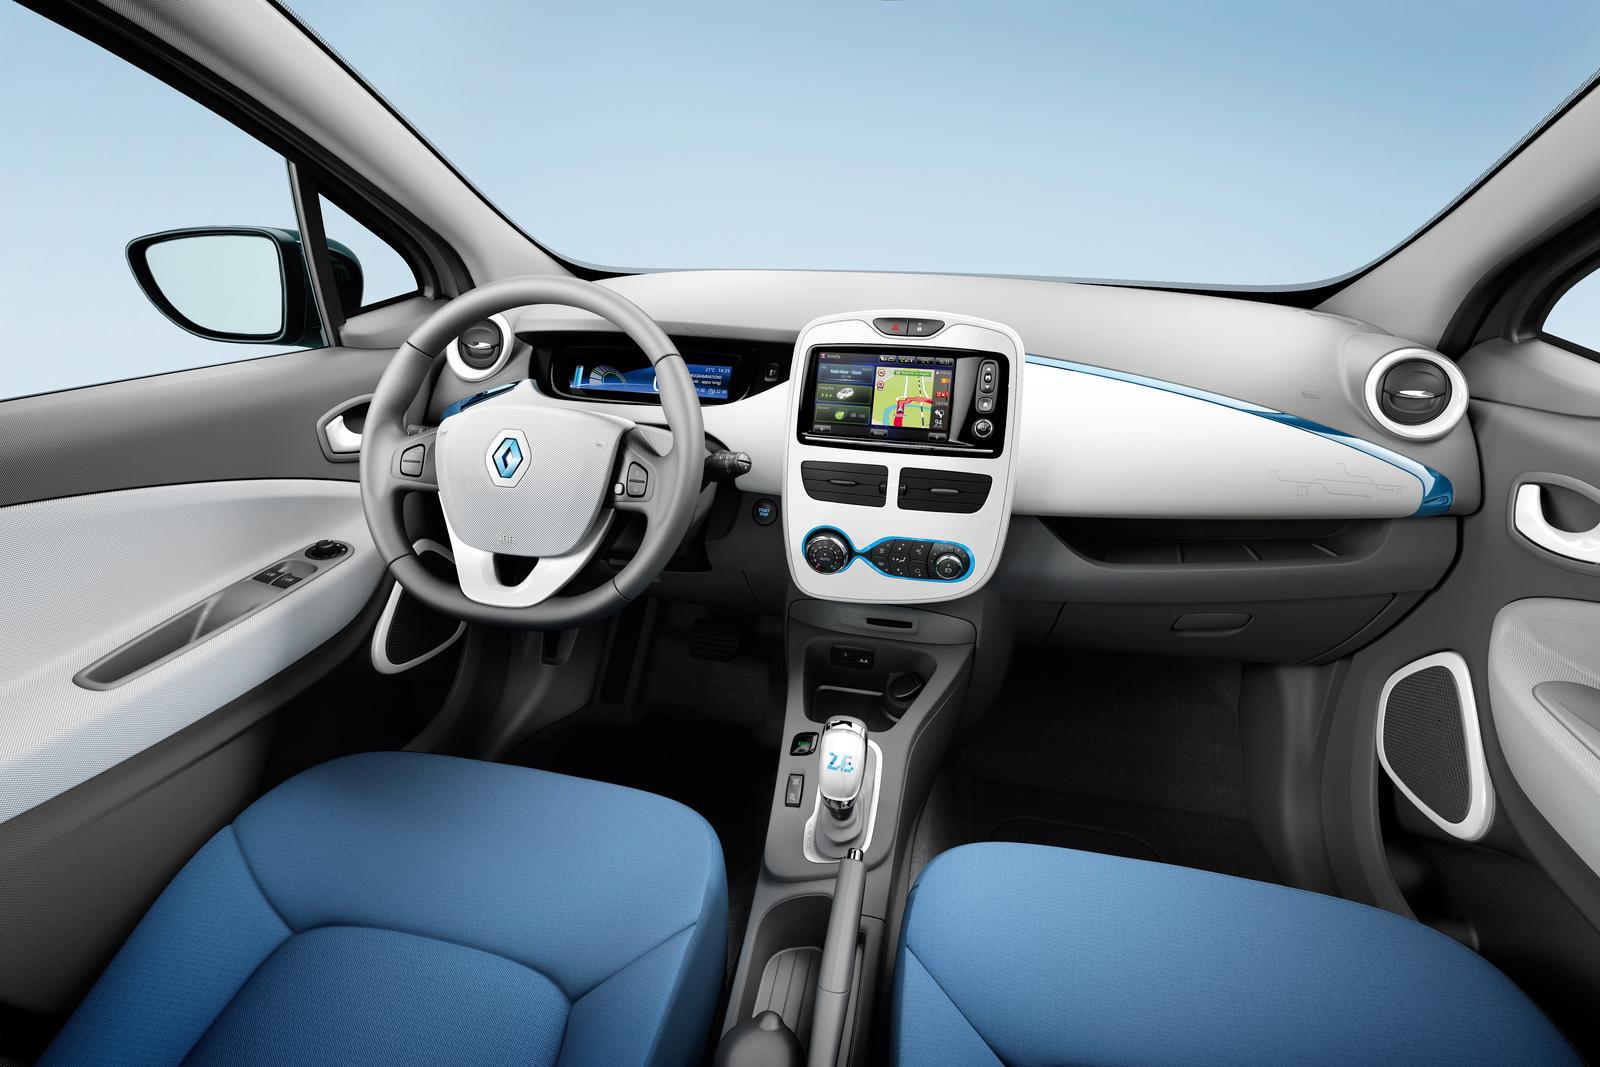 Zoe Expression / Life Interior Trim (Image: Renault)